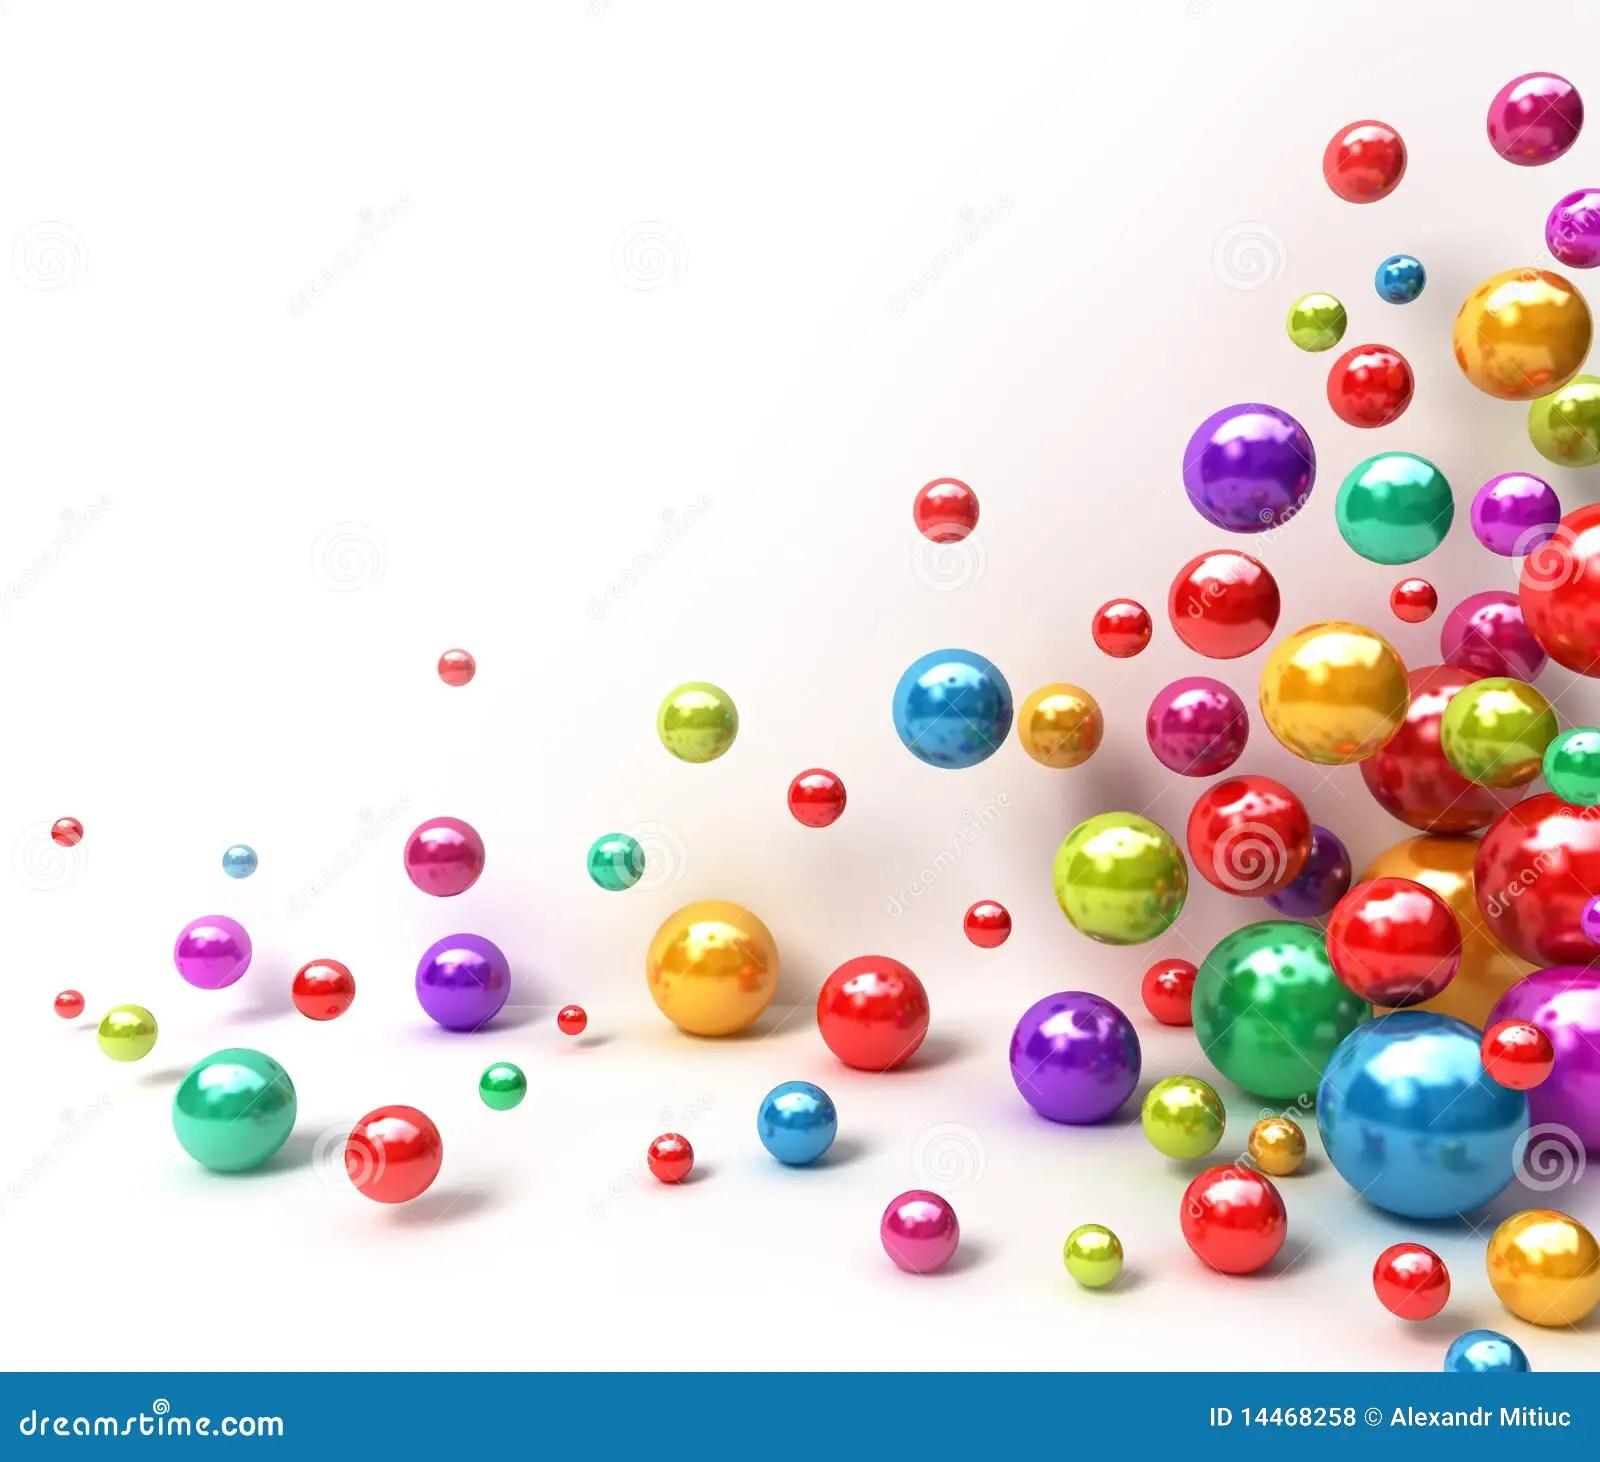 Bolas Coloridas Brillantes Fondo Abstracto Stock De